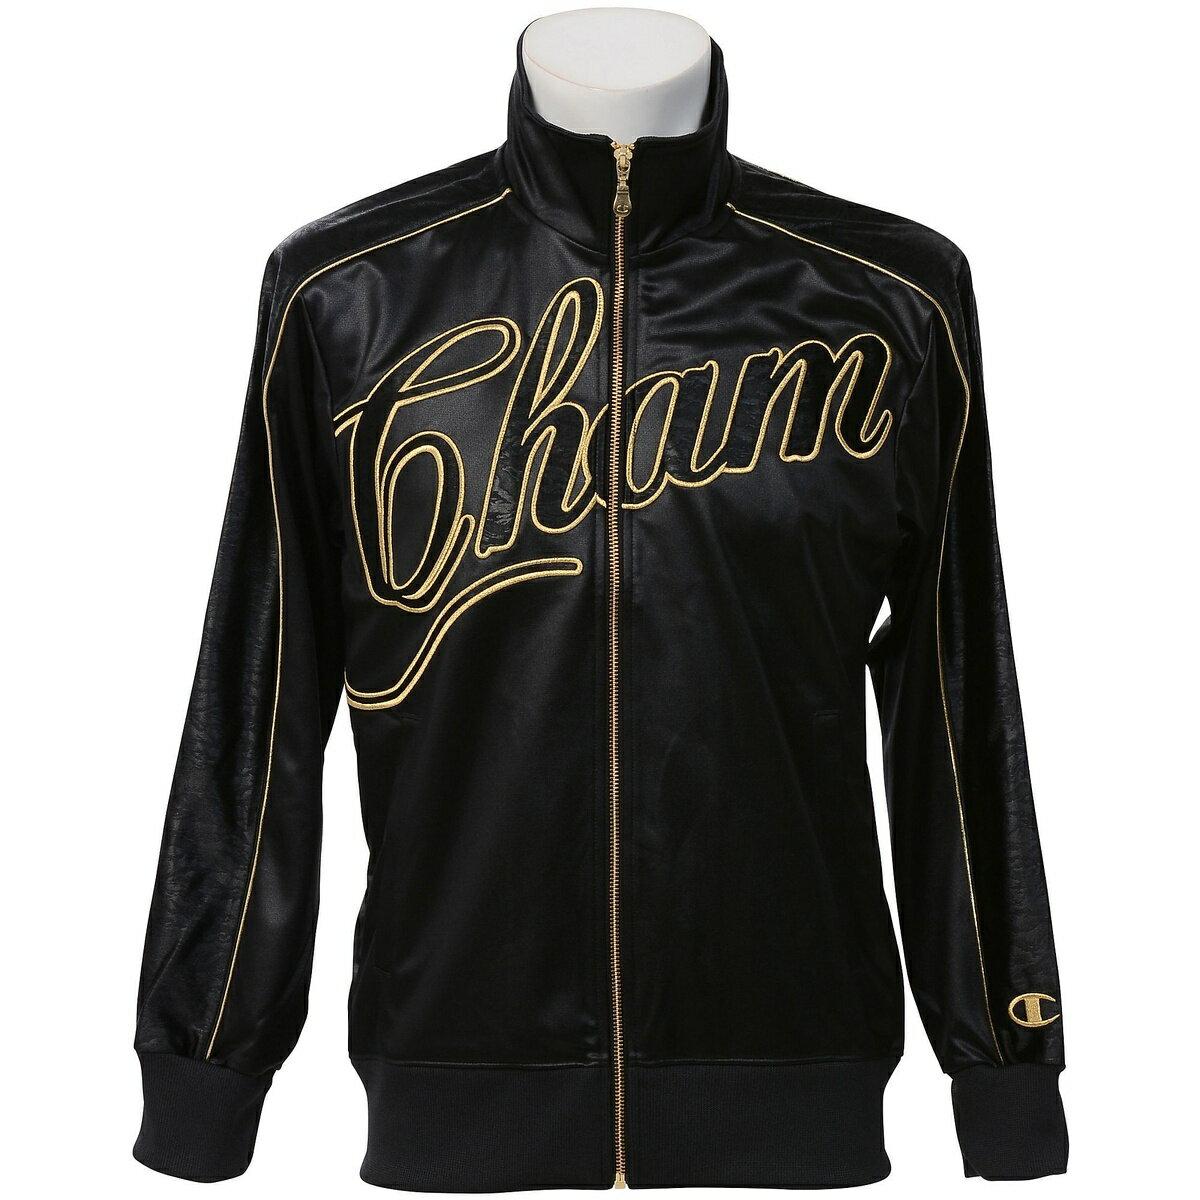 Champion (チャンピオン) メンズスポーツウェア ウォームアップジャケット ジップジャージージャケット ブラック Z CW1317-K